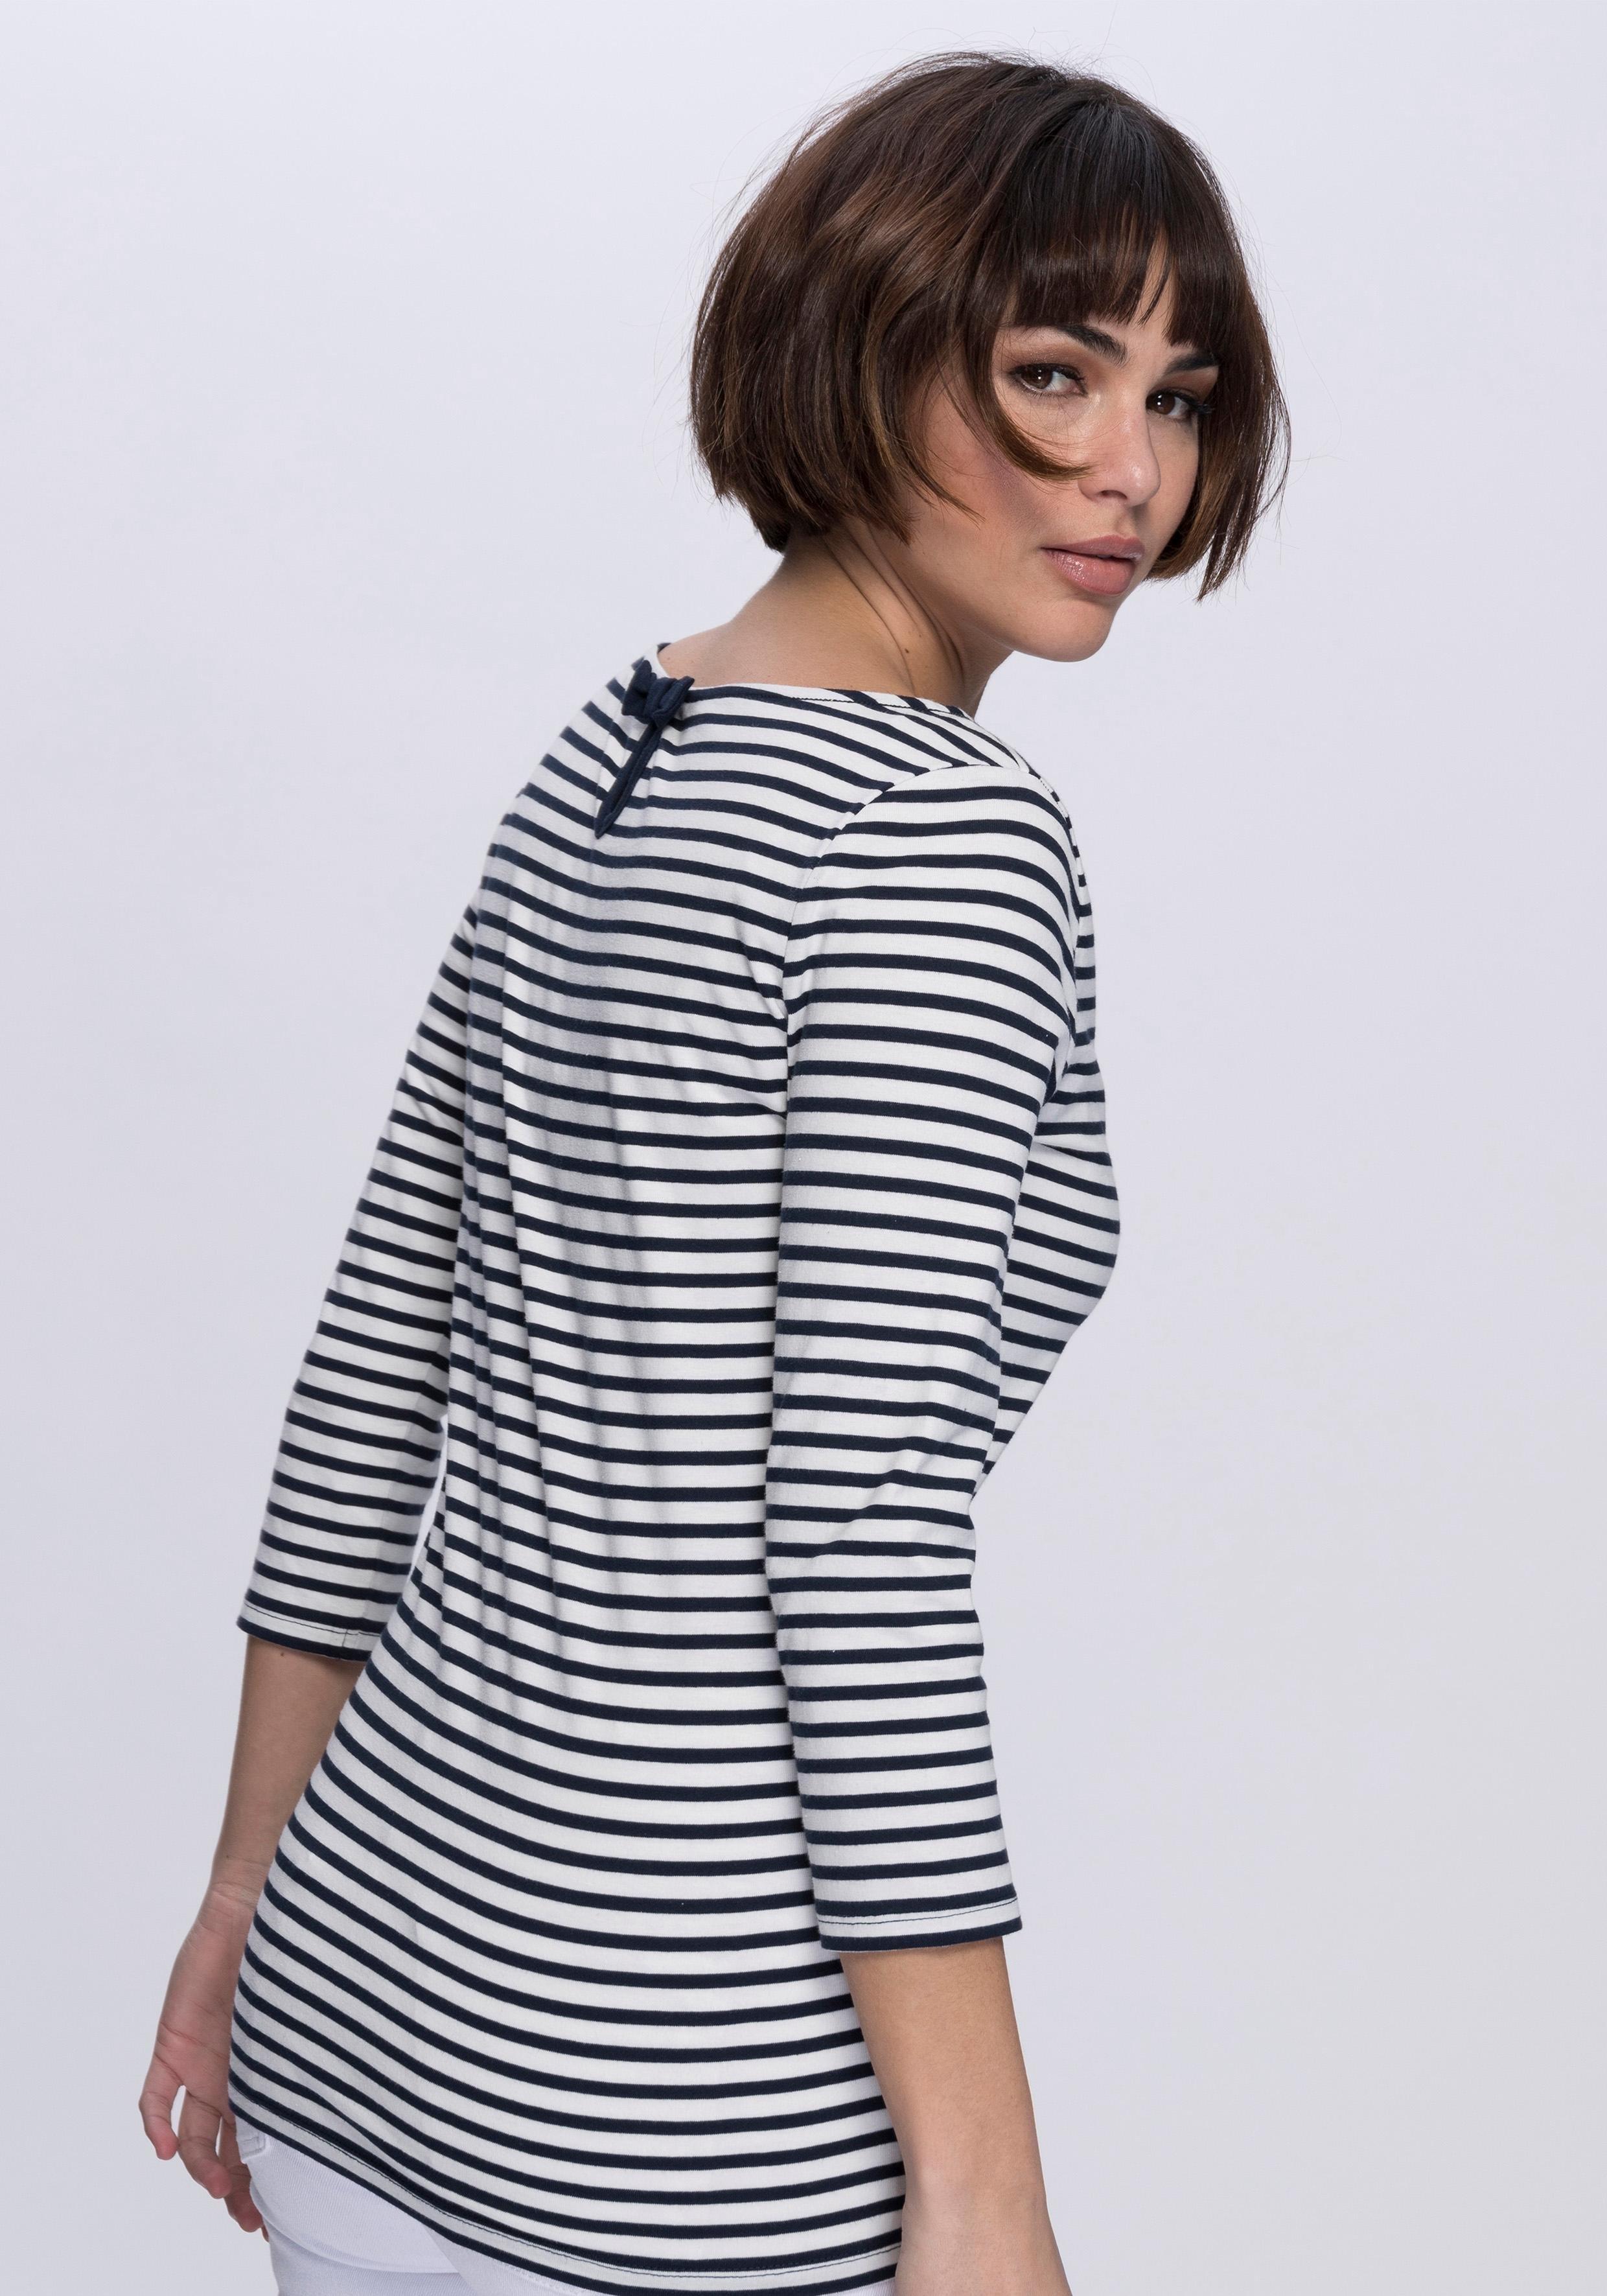 Edc Met Shirt Lange Mouwen Makkelijk Esprit By Besteld W2e9IYHDbE